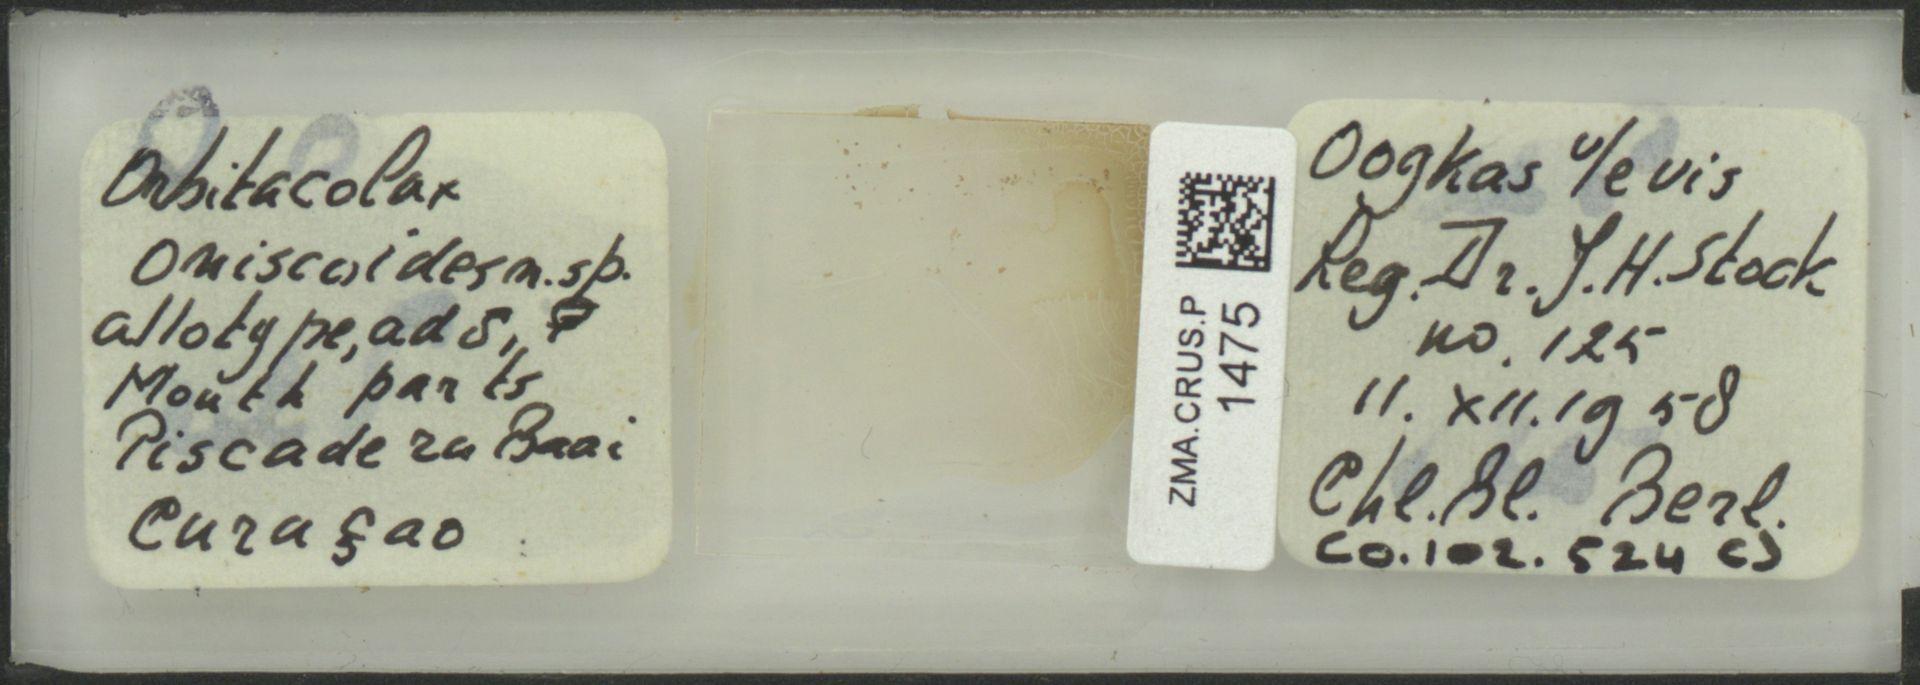 ZMA.CRUS.P.1475   Orbitocolax oniscoides